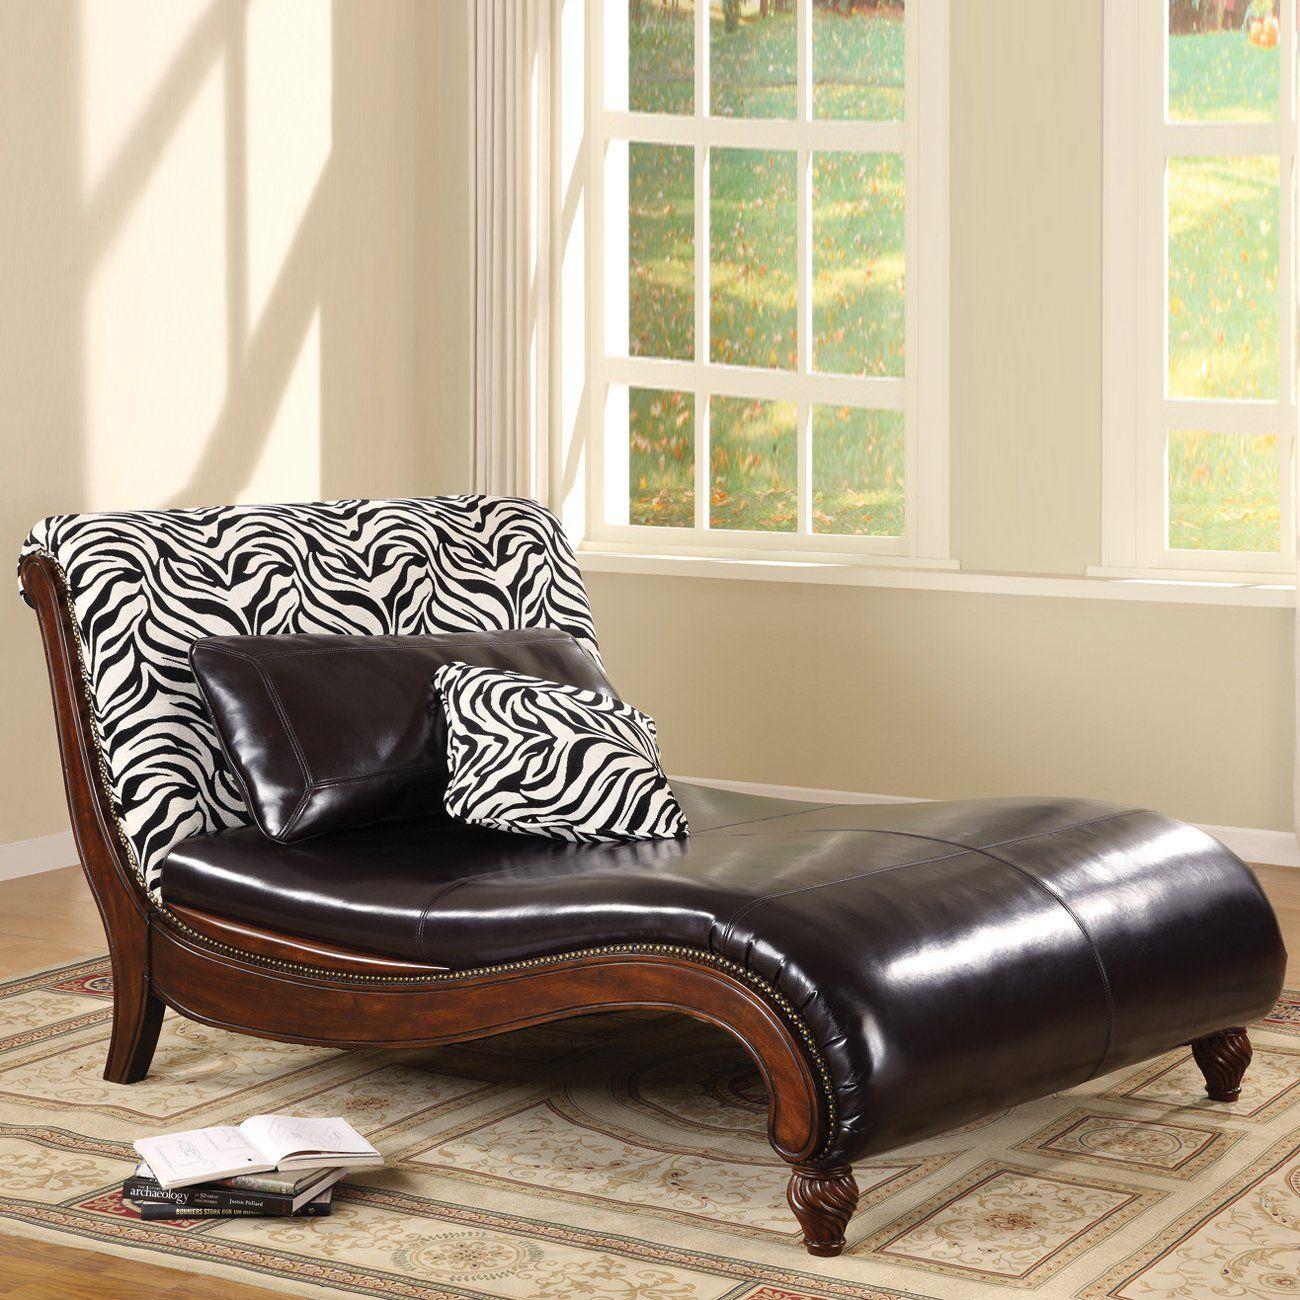 Coaster Fine Furniture 550061 Chaise - Home Furniture ...